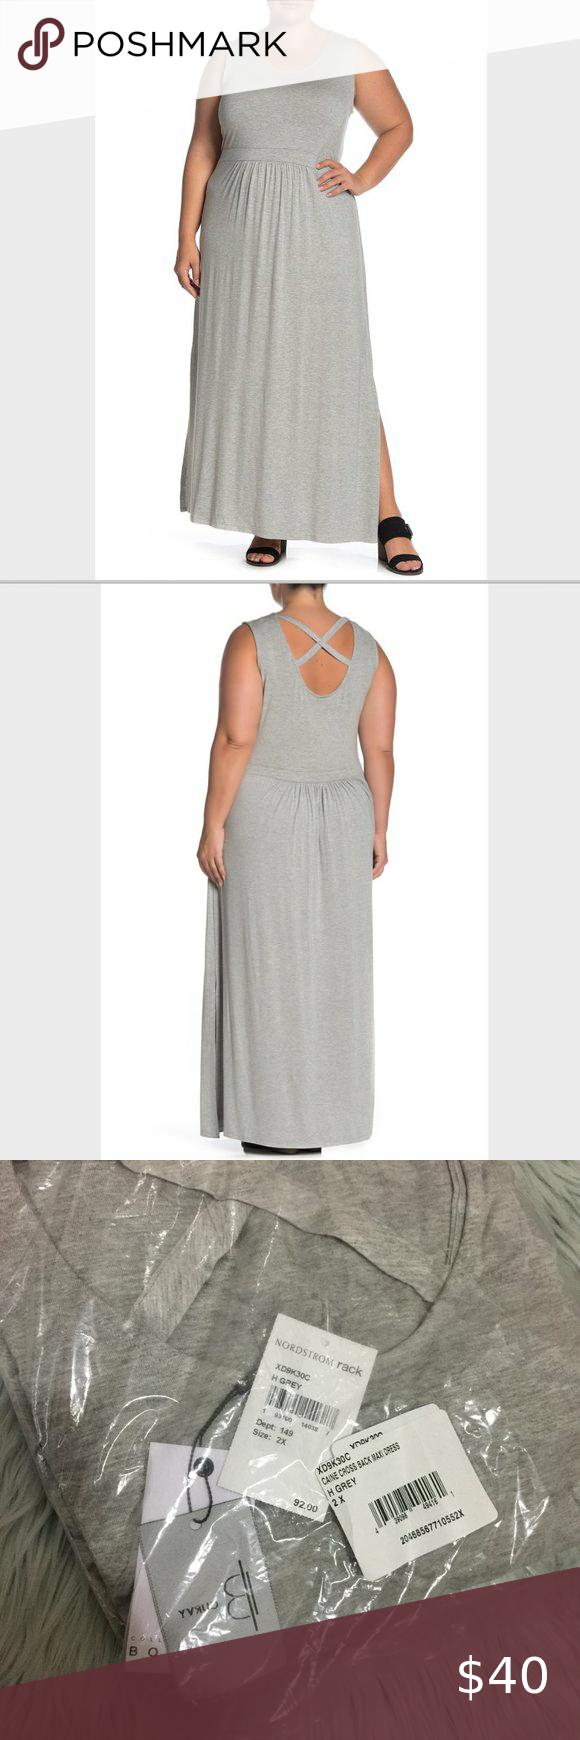 92 New 2x Bobeau Cane Gray Maxi Dress Grey Maxi Dress Knit Maxi Skirt Maxi Dress [ 1740 x 580 Pixel ]